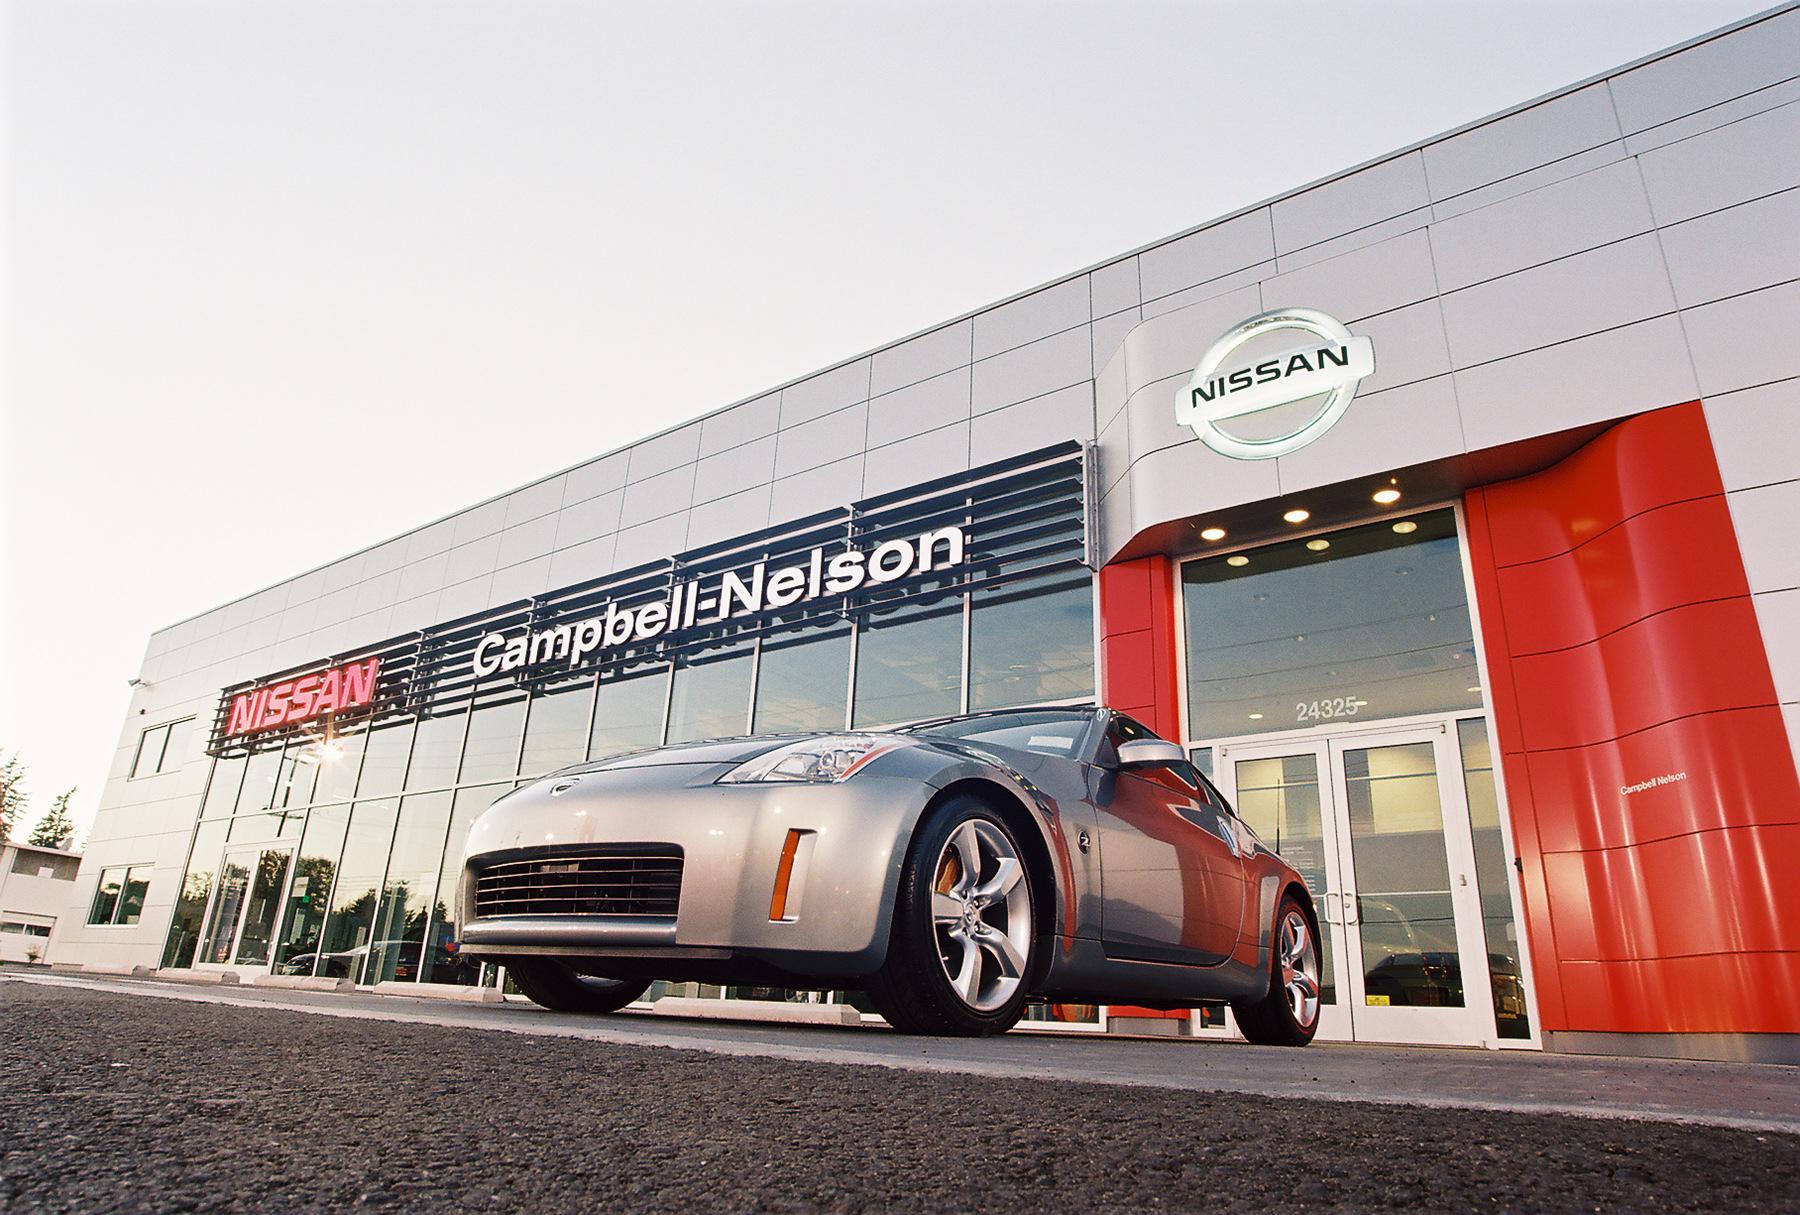 Campbell Nelson Nissan >> Campbell Nelson Nissan Edmonds Wilcox Construction